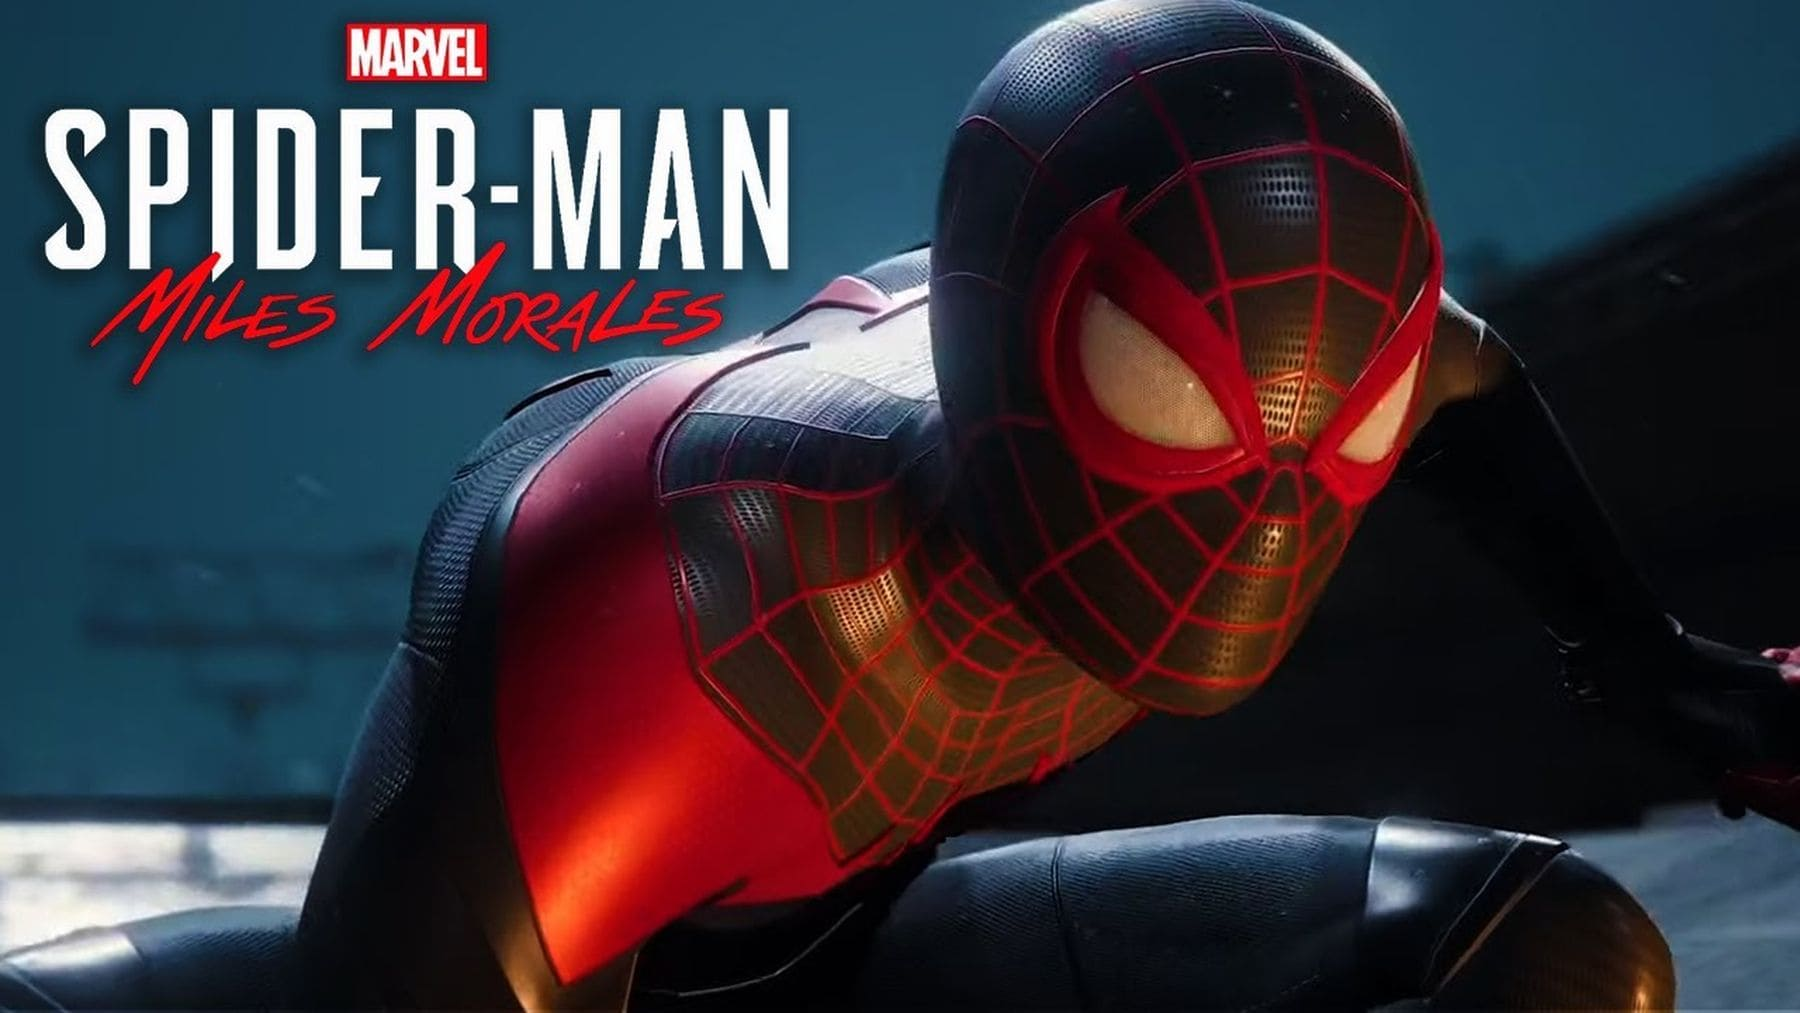 Gameplay-Trailer: Marvel's Spider-Man – Miles Morales | Games | Was is hier eigentlich los?